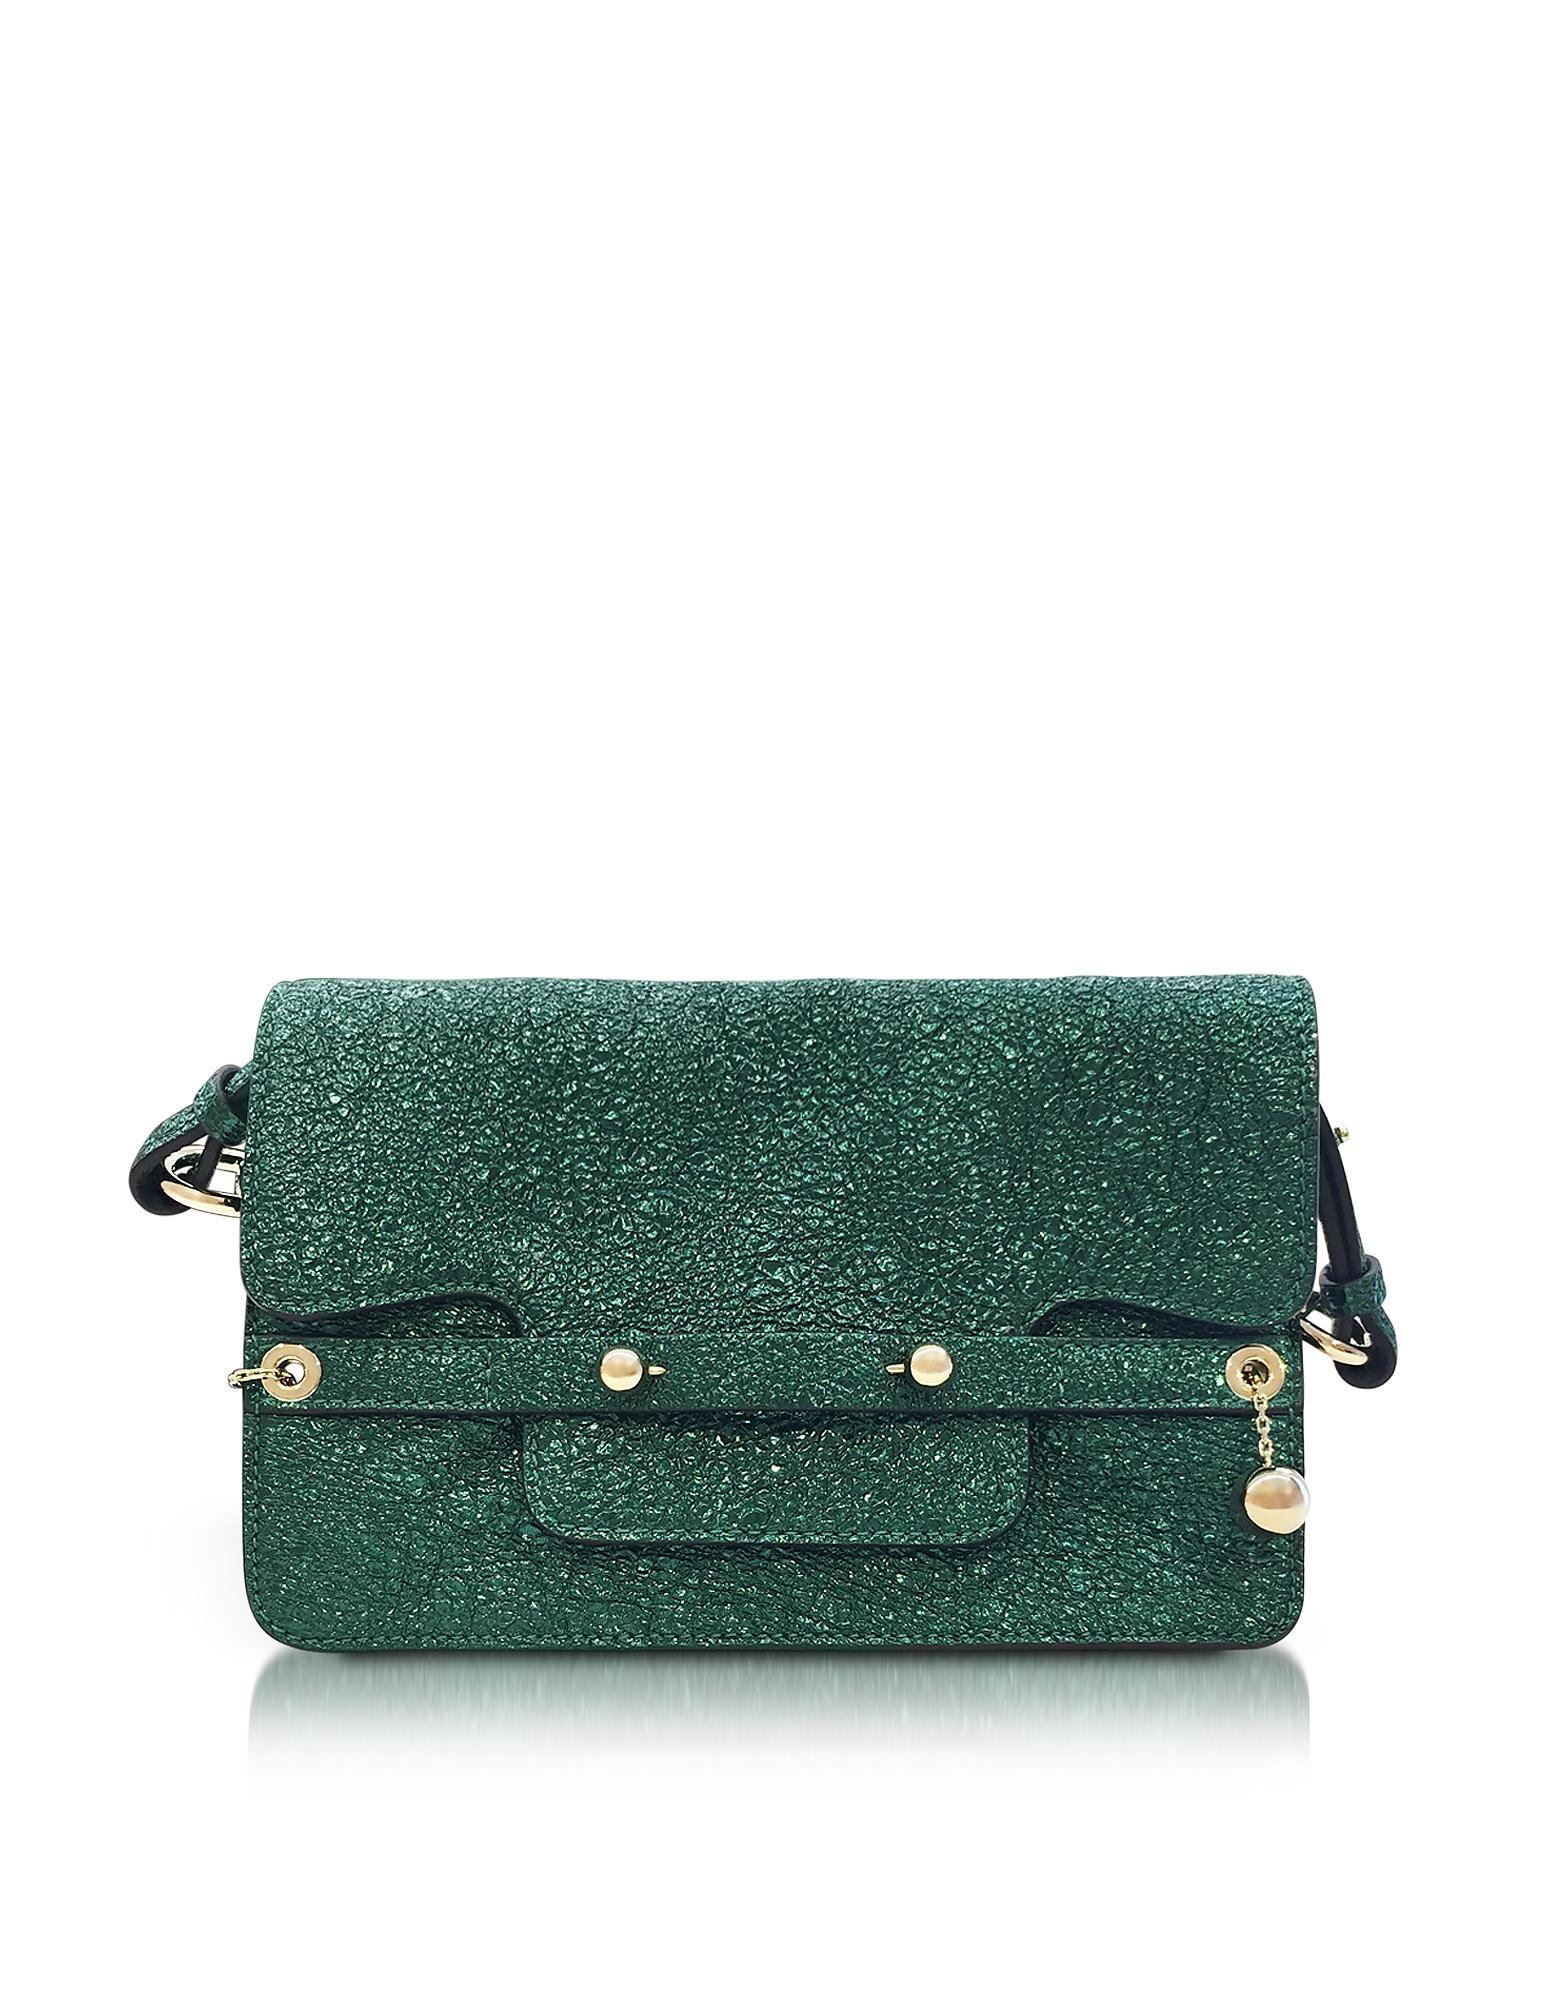 Red Valentino Dark Green Crackled Metallic Leather Flap Top Crossbody Bag